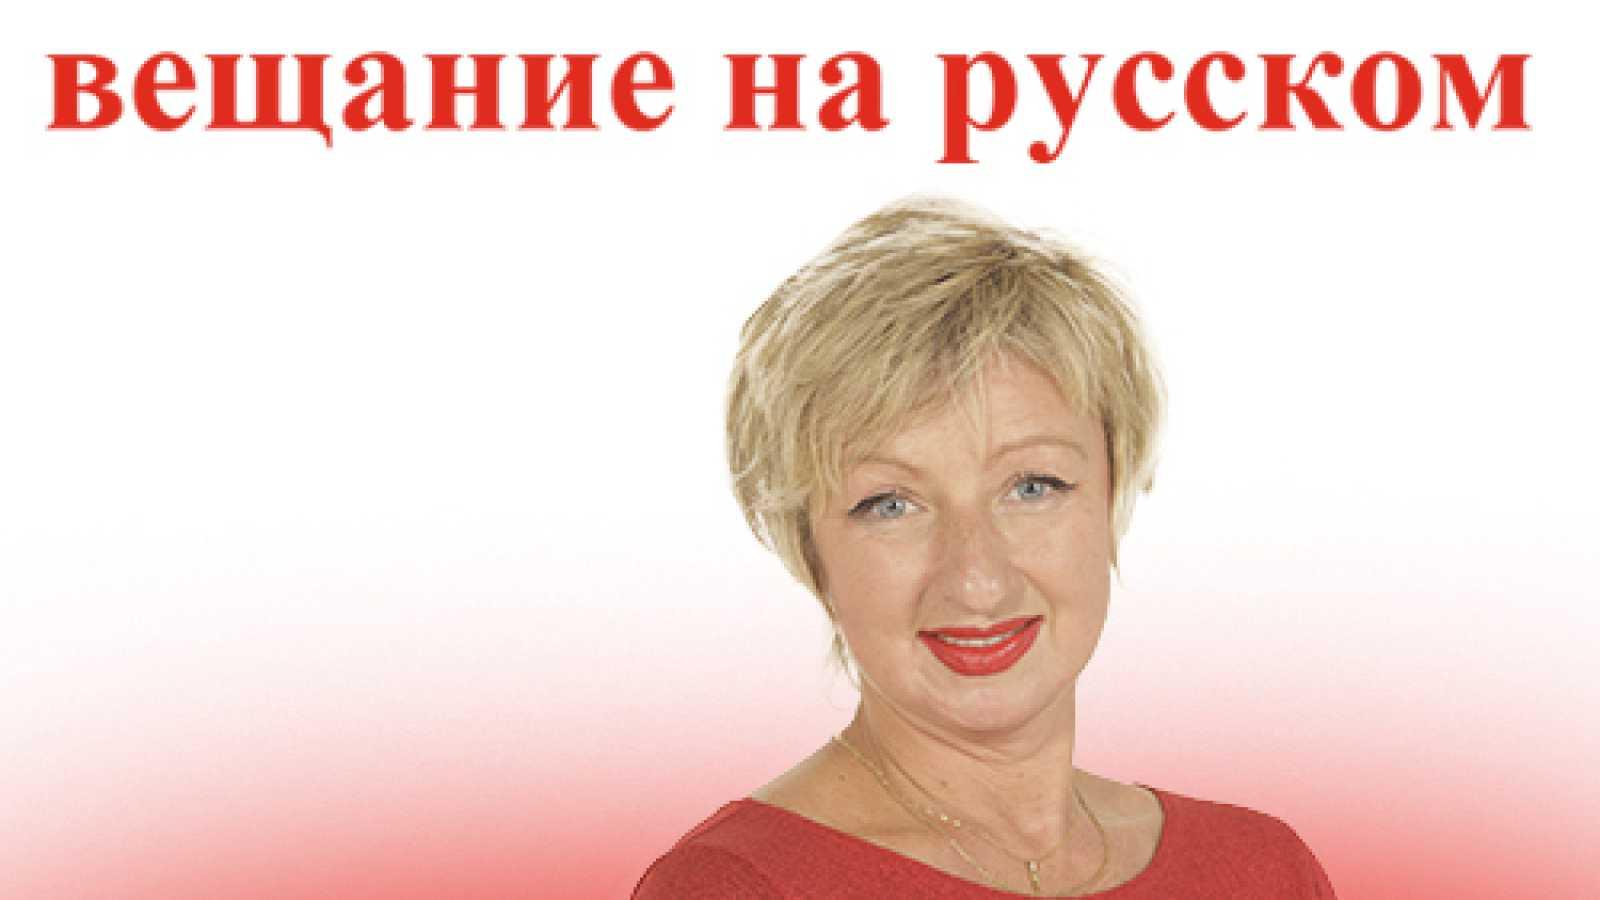 Emisión en ruso - Ángel Luis Encinas Moral. Besédi vo vrémeni:  eto zagadochnoye 'Slovo o polky Igoreve' - 12/04/21 - escuchar ahora